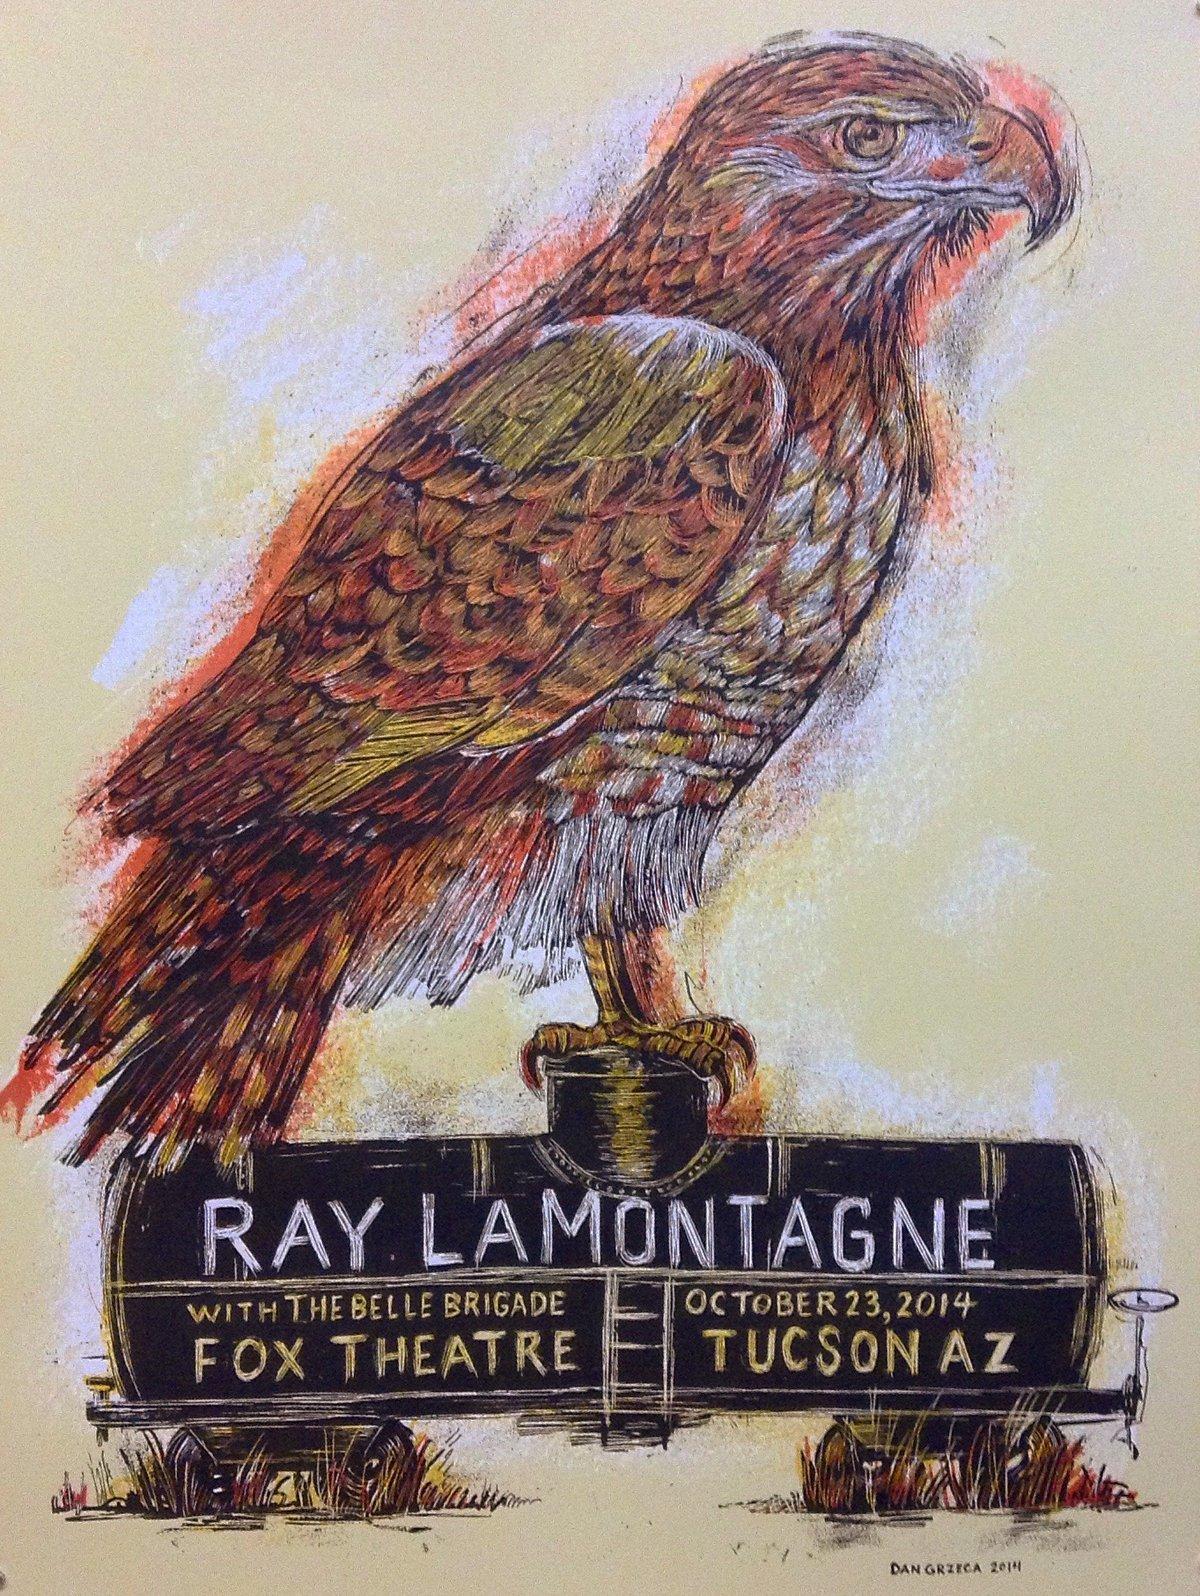 Ray LaMontagne Tucson poster